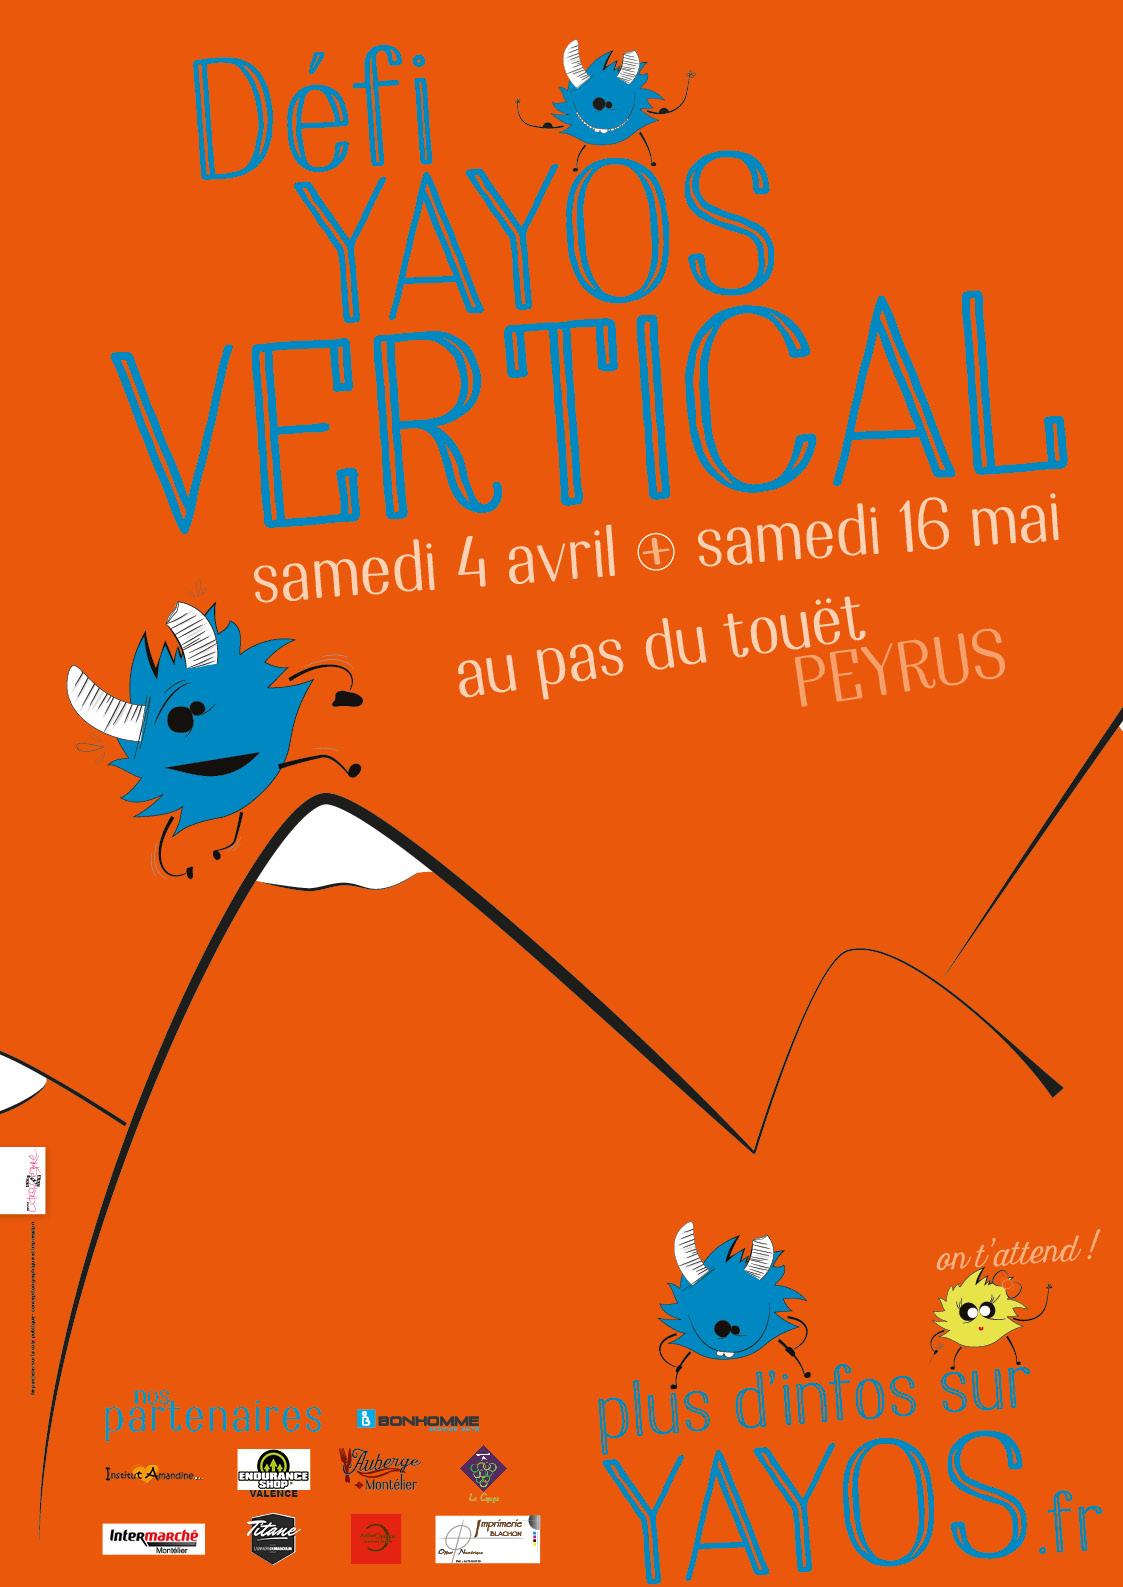 defi-yayos-vertical-trail-peyrus-avril-mai-2015